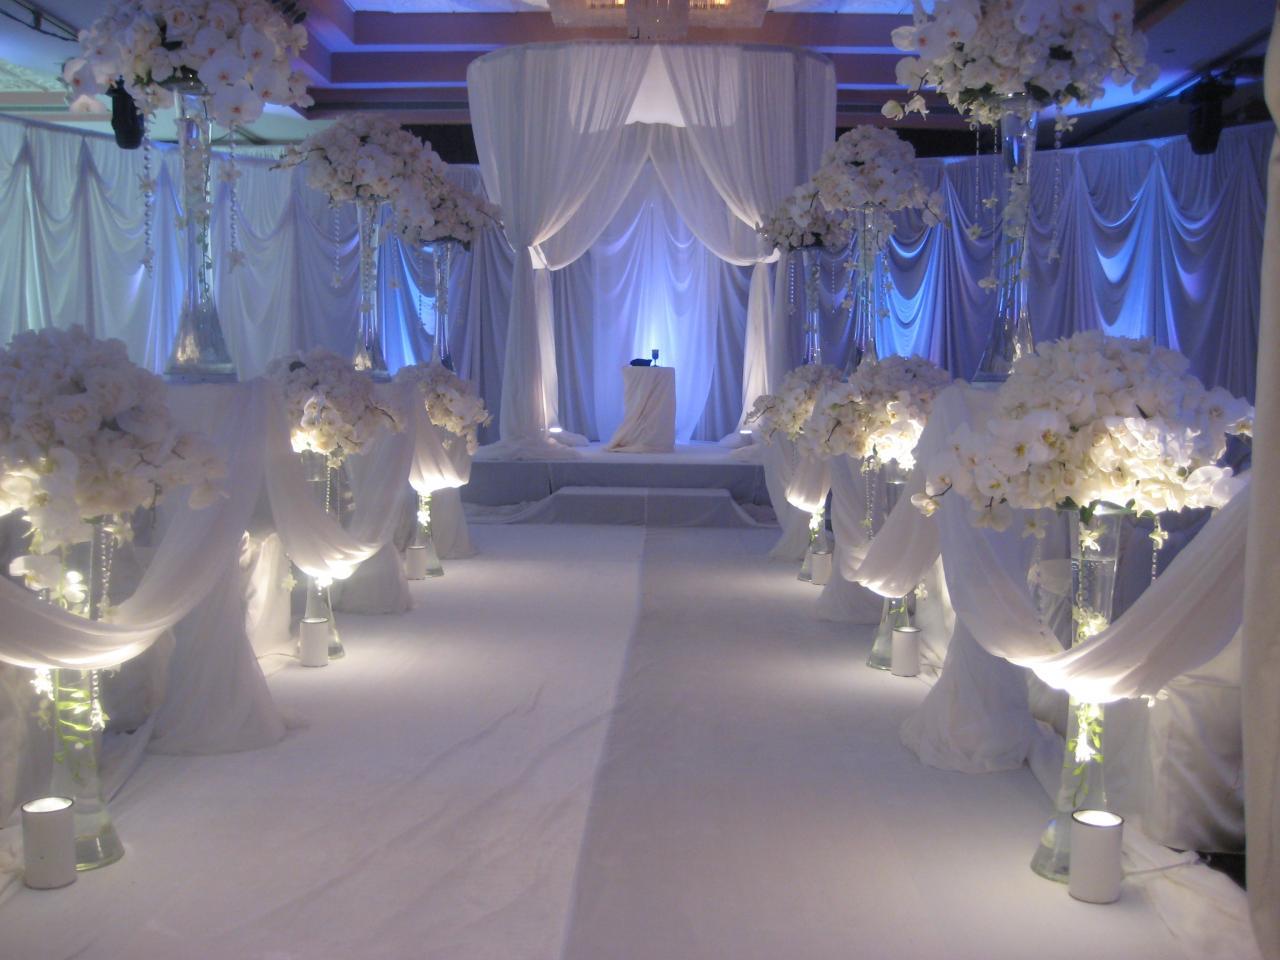 Wedding Decorations Wedding Decorations Accessories  Wedding Pictures